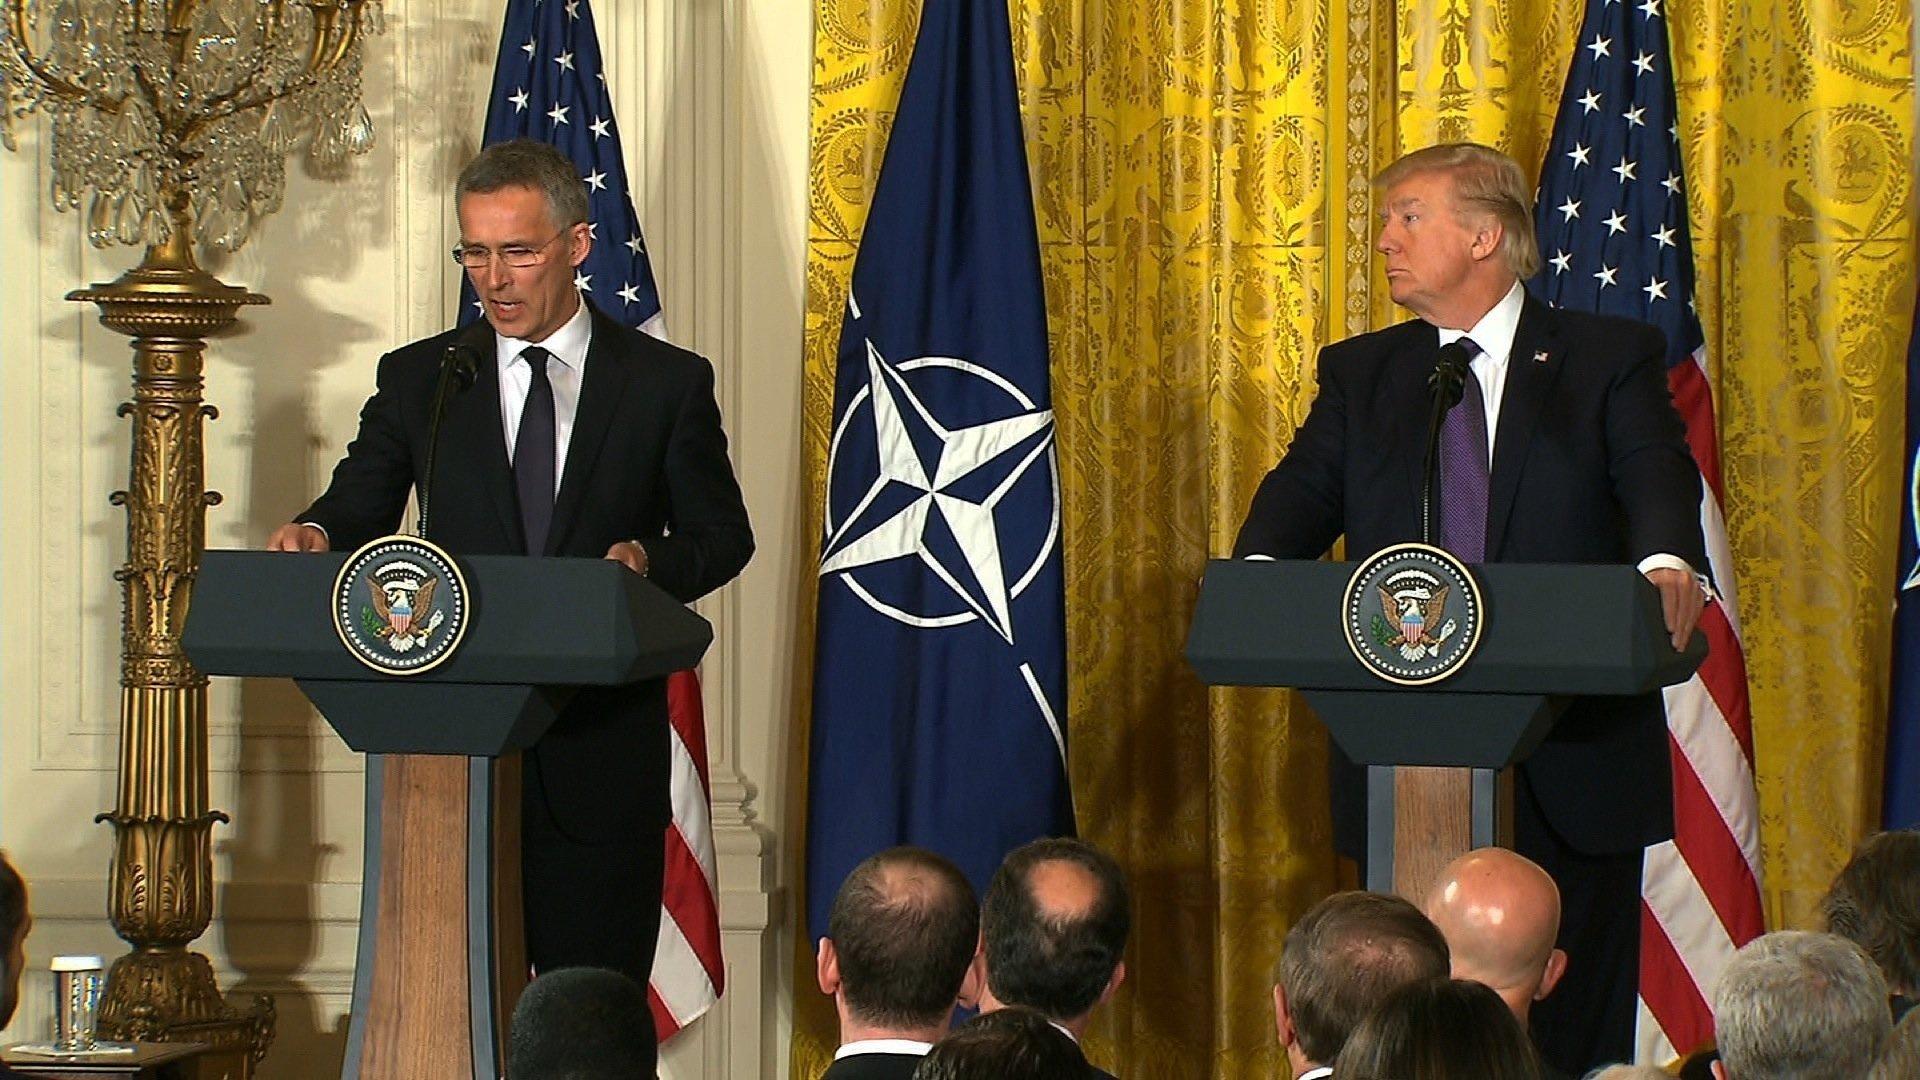 Putin ignores US call for fresh start and backs Assad regime